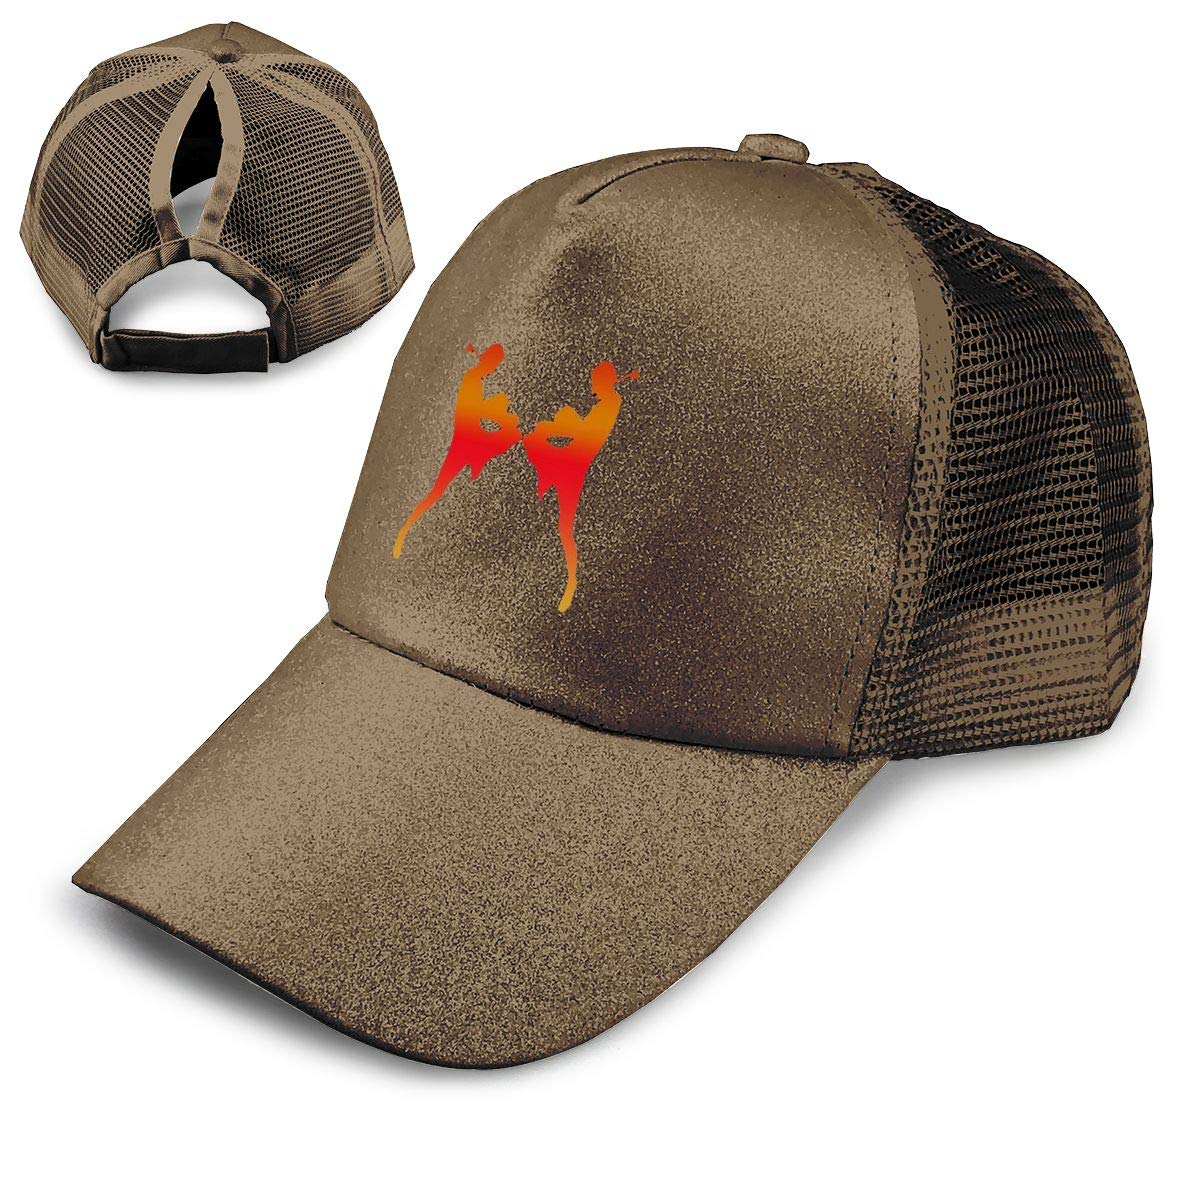 Kickboxing Ponytail Messy High Bun Hat Ponycaps Baseball Cap Adjustable Trucker Cap Mesh Cap